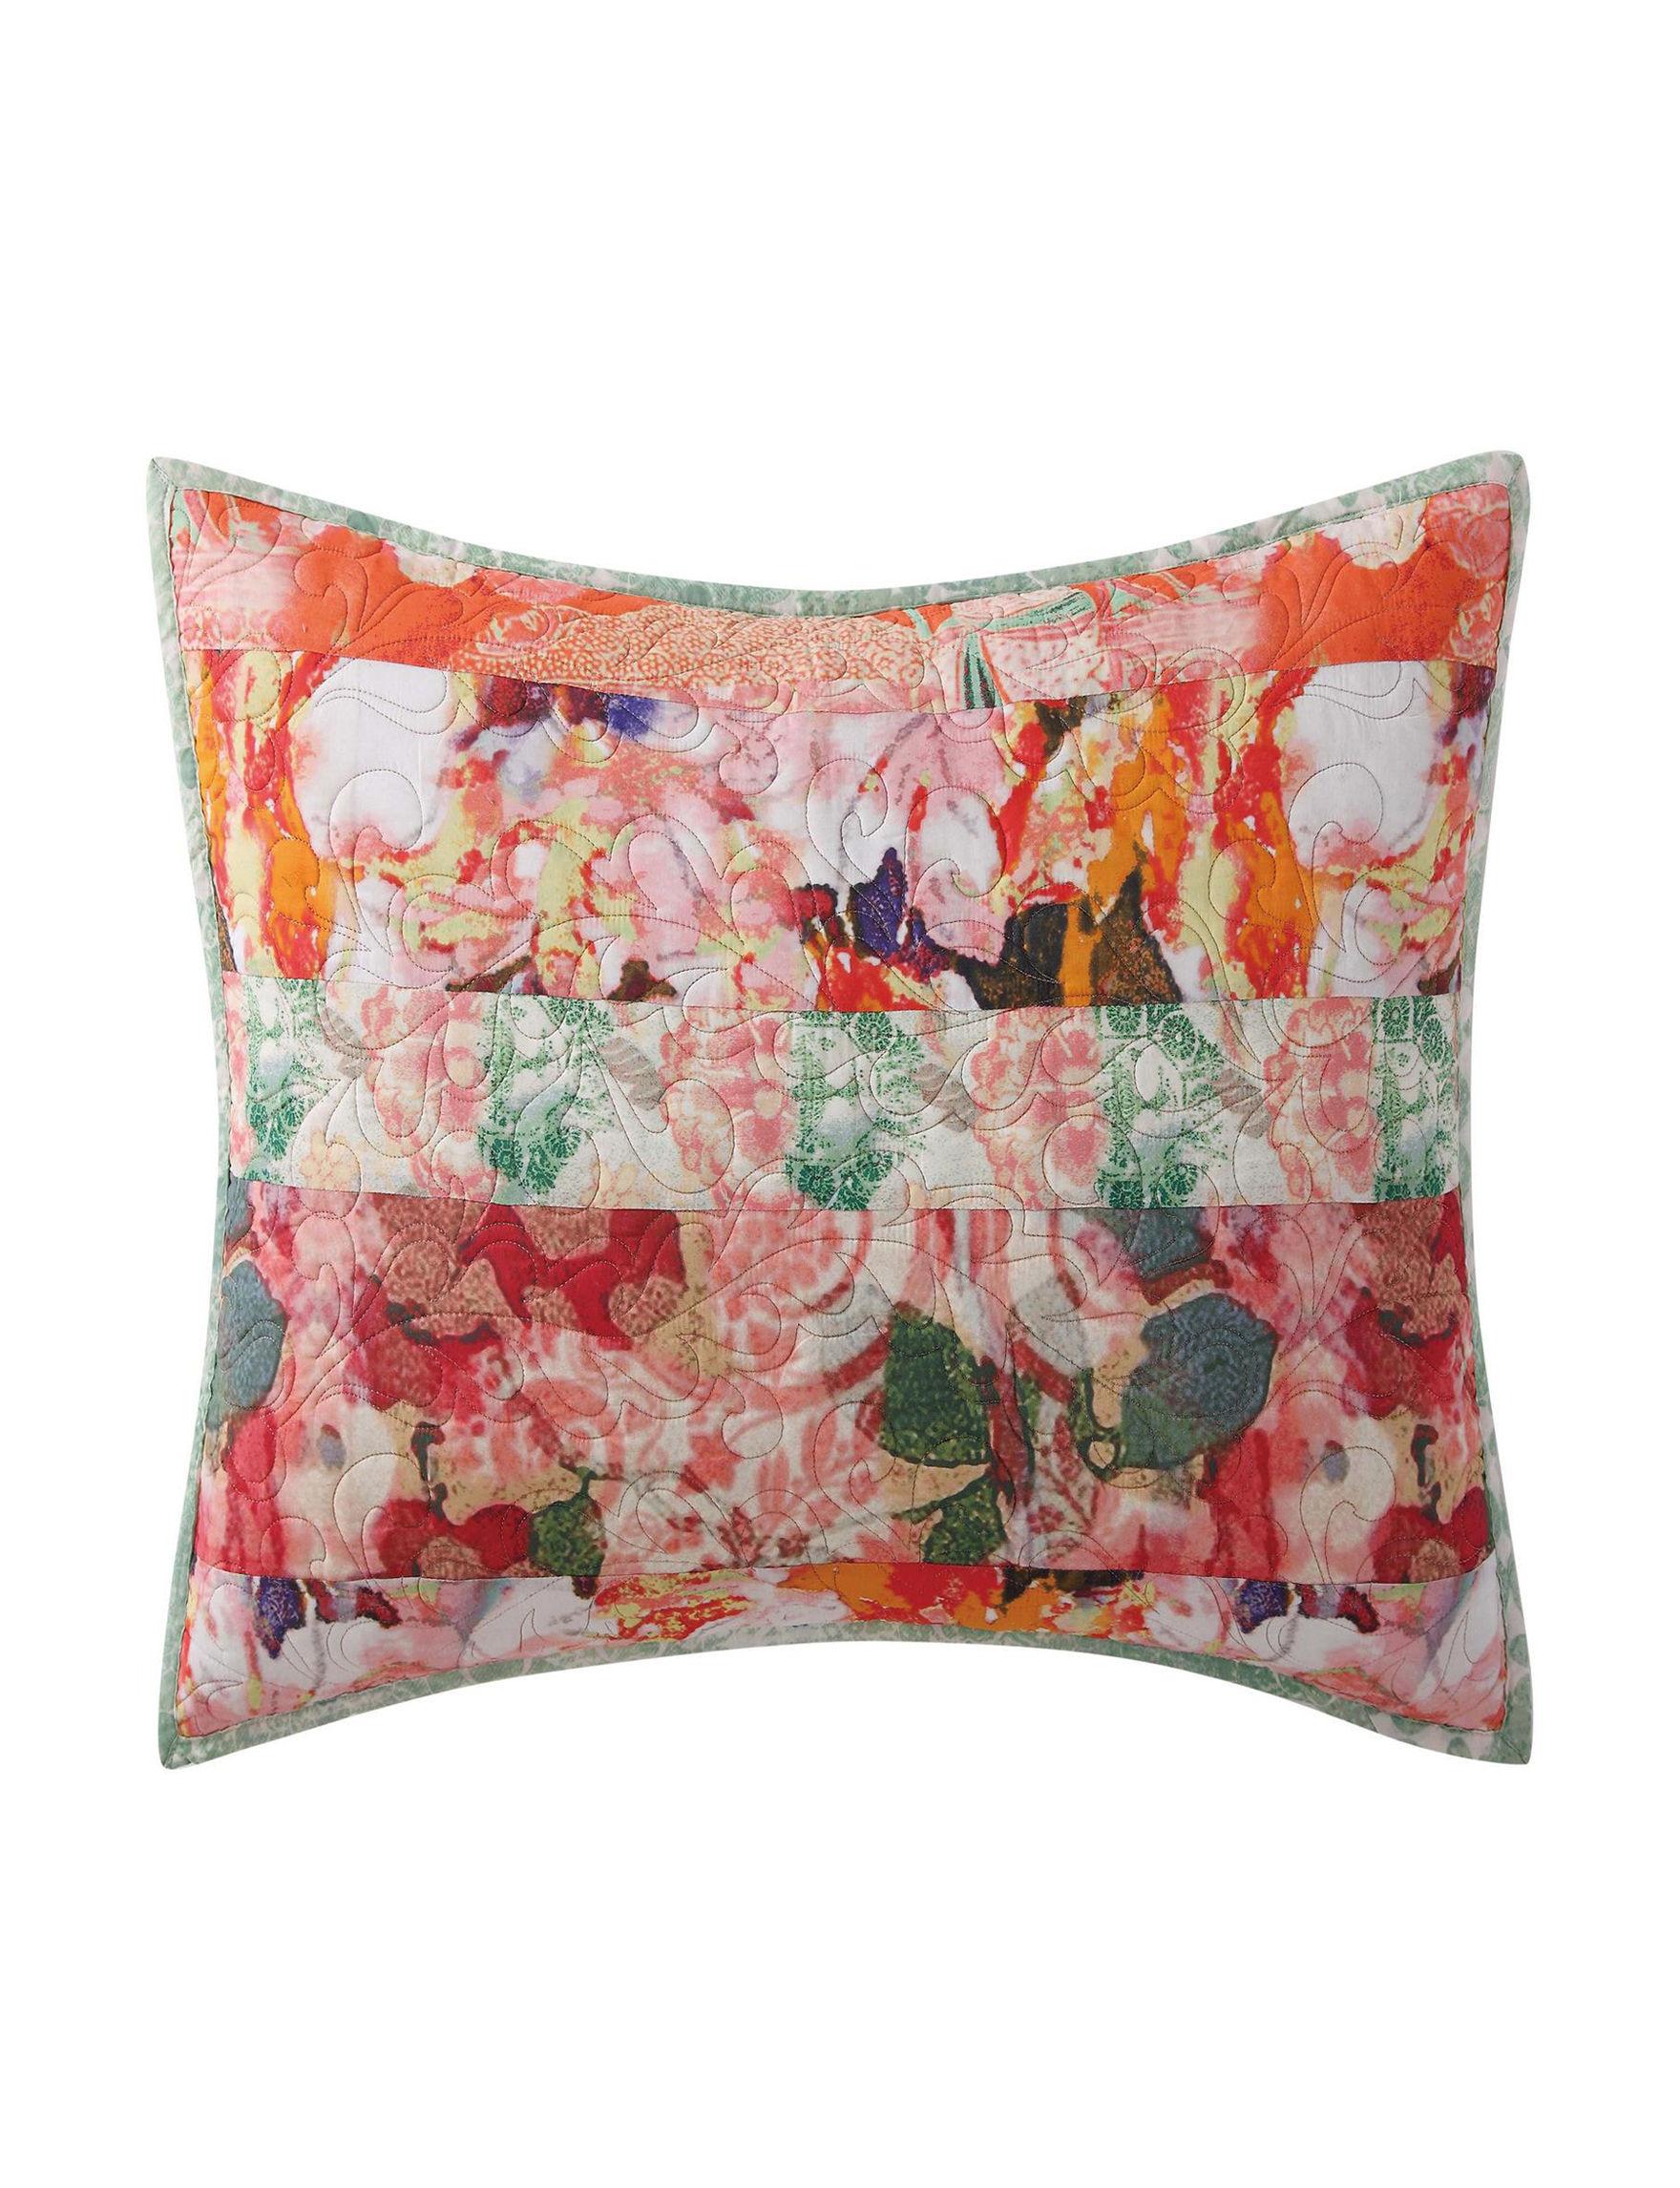 Tracy Porter Pink Pillow Shams